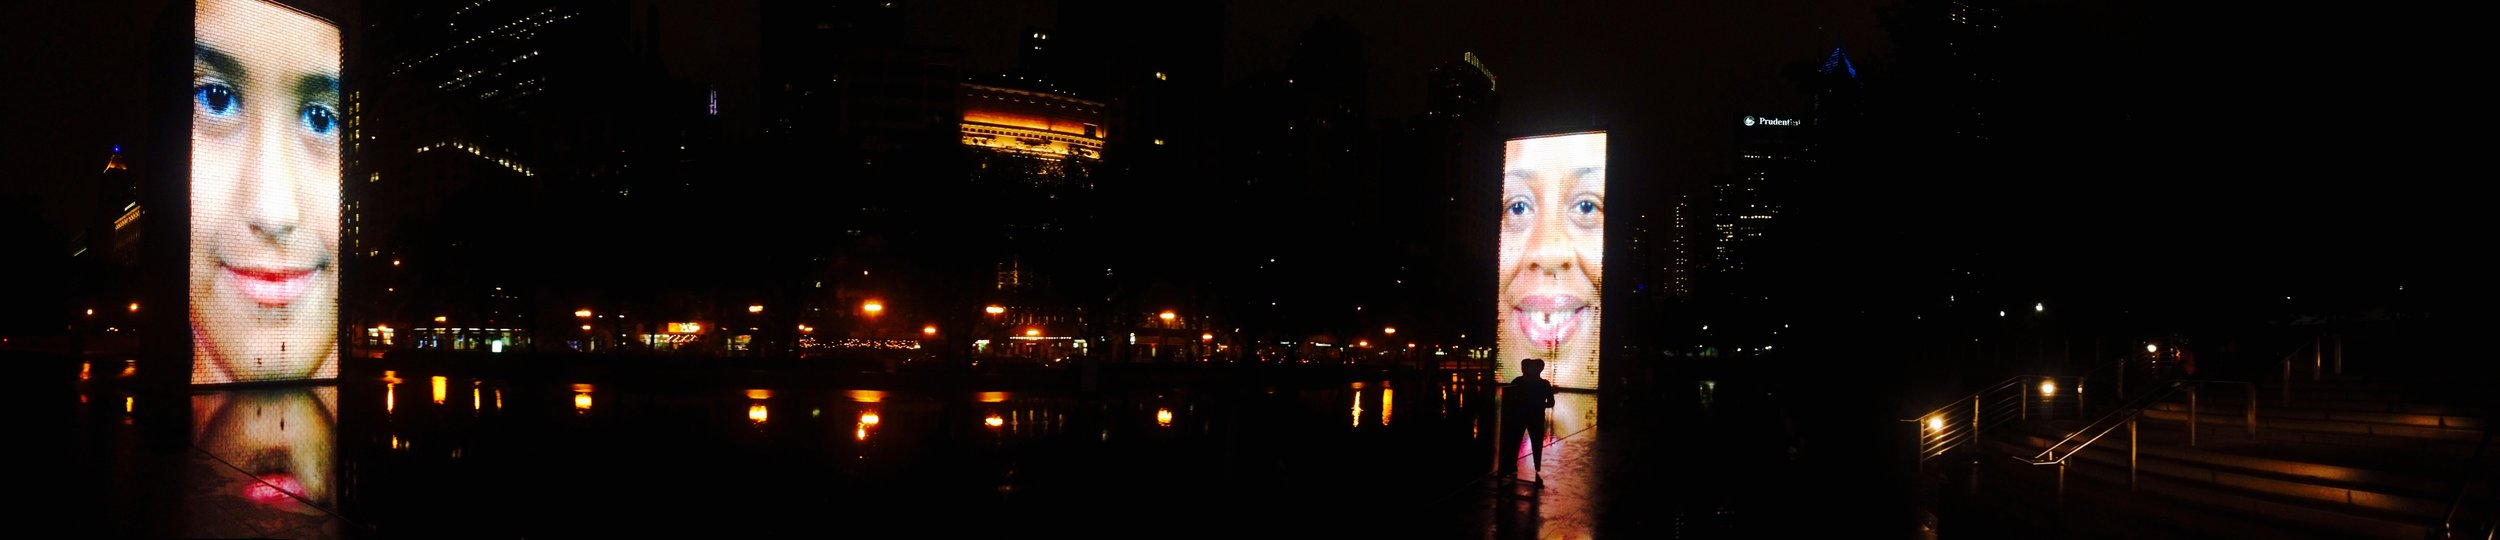 Crown Fountain at night by  Catalan artist Jaume Plensa ,